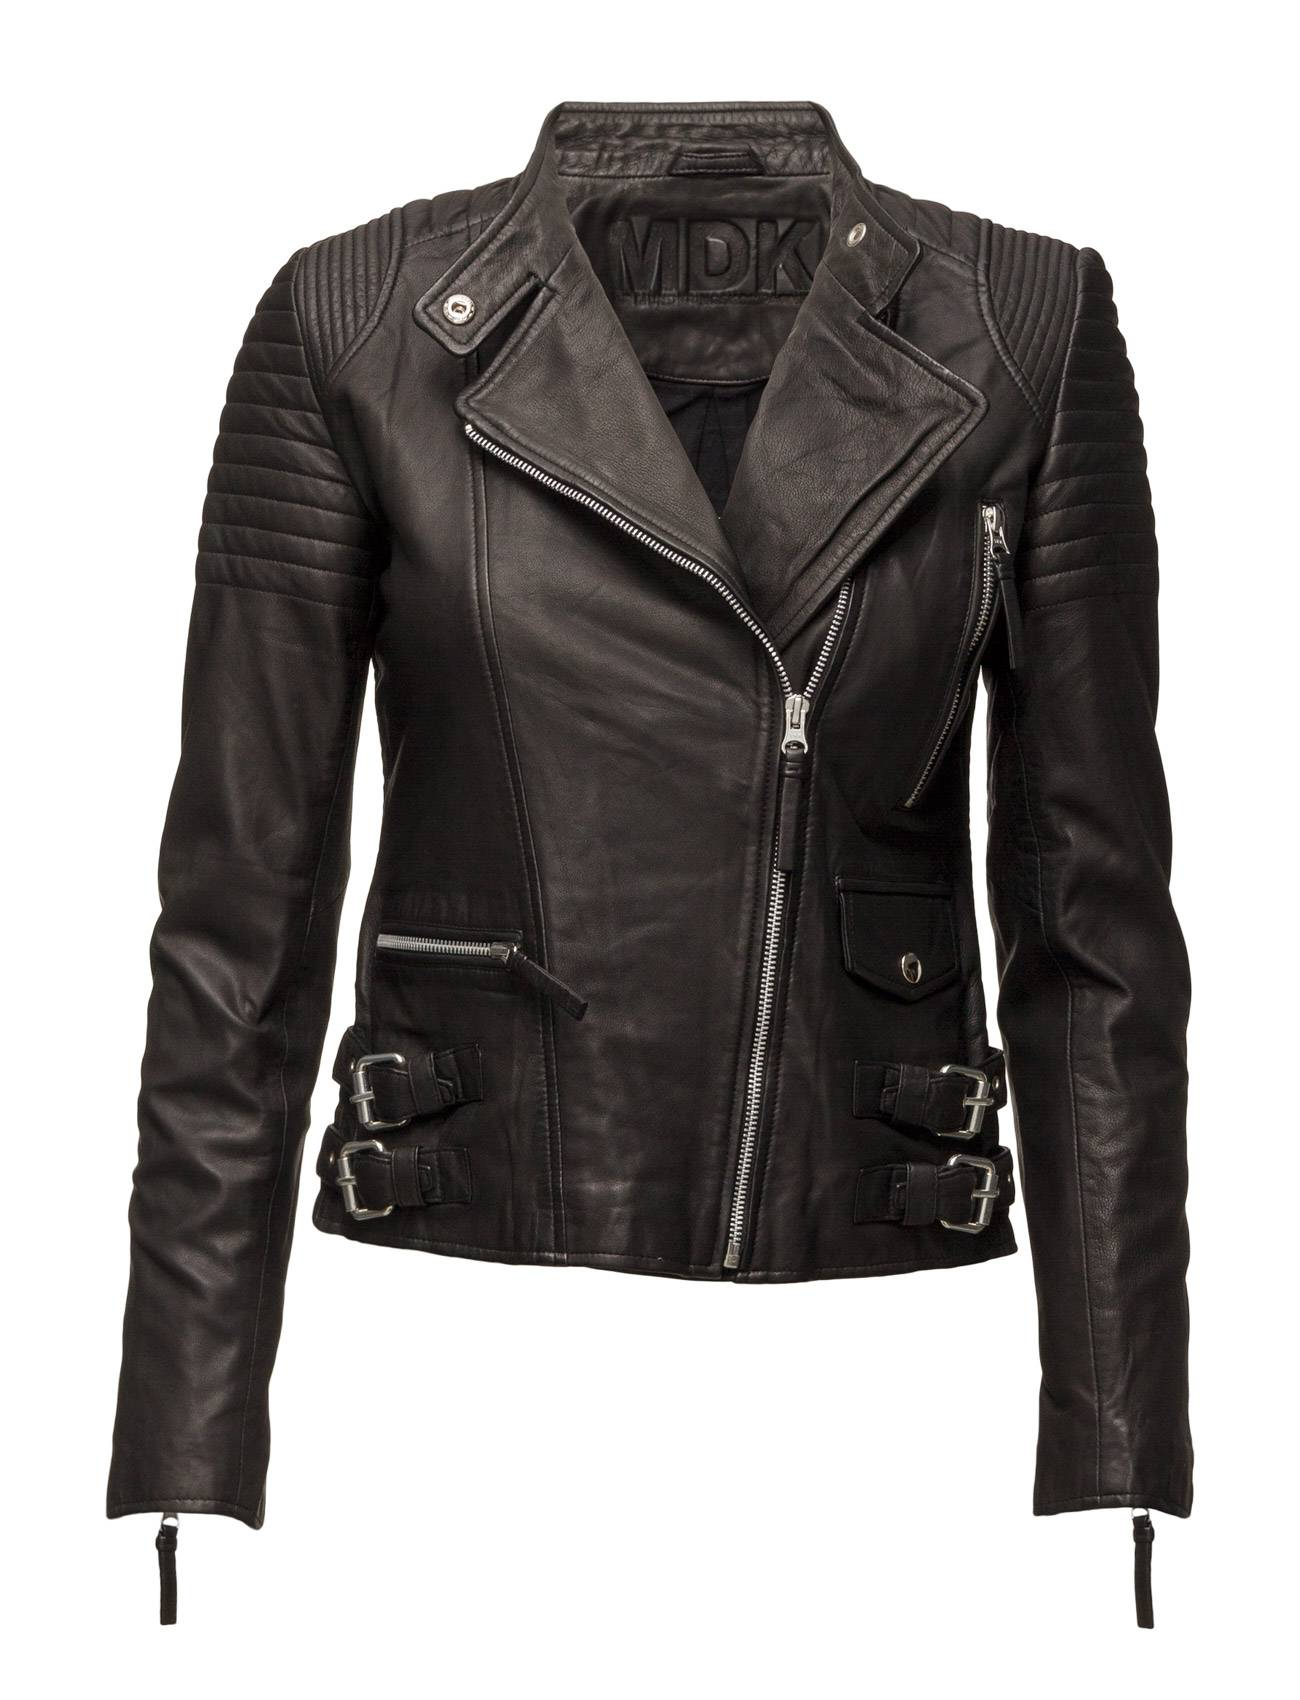 MDK / Munderingskompagniet City Biker Leather Jacket